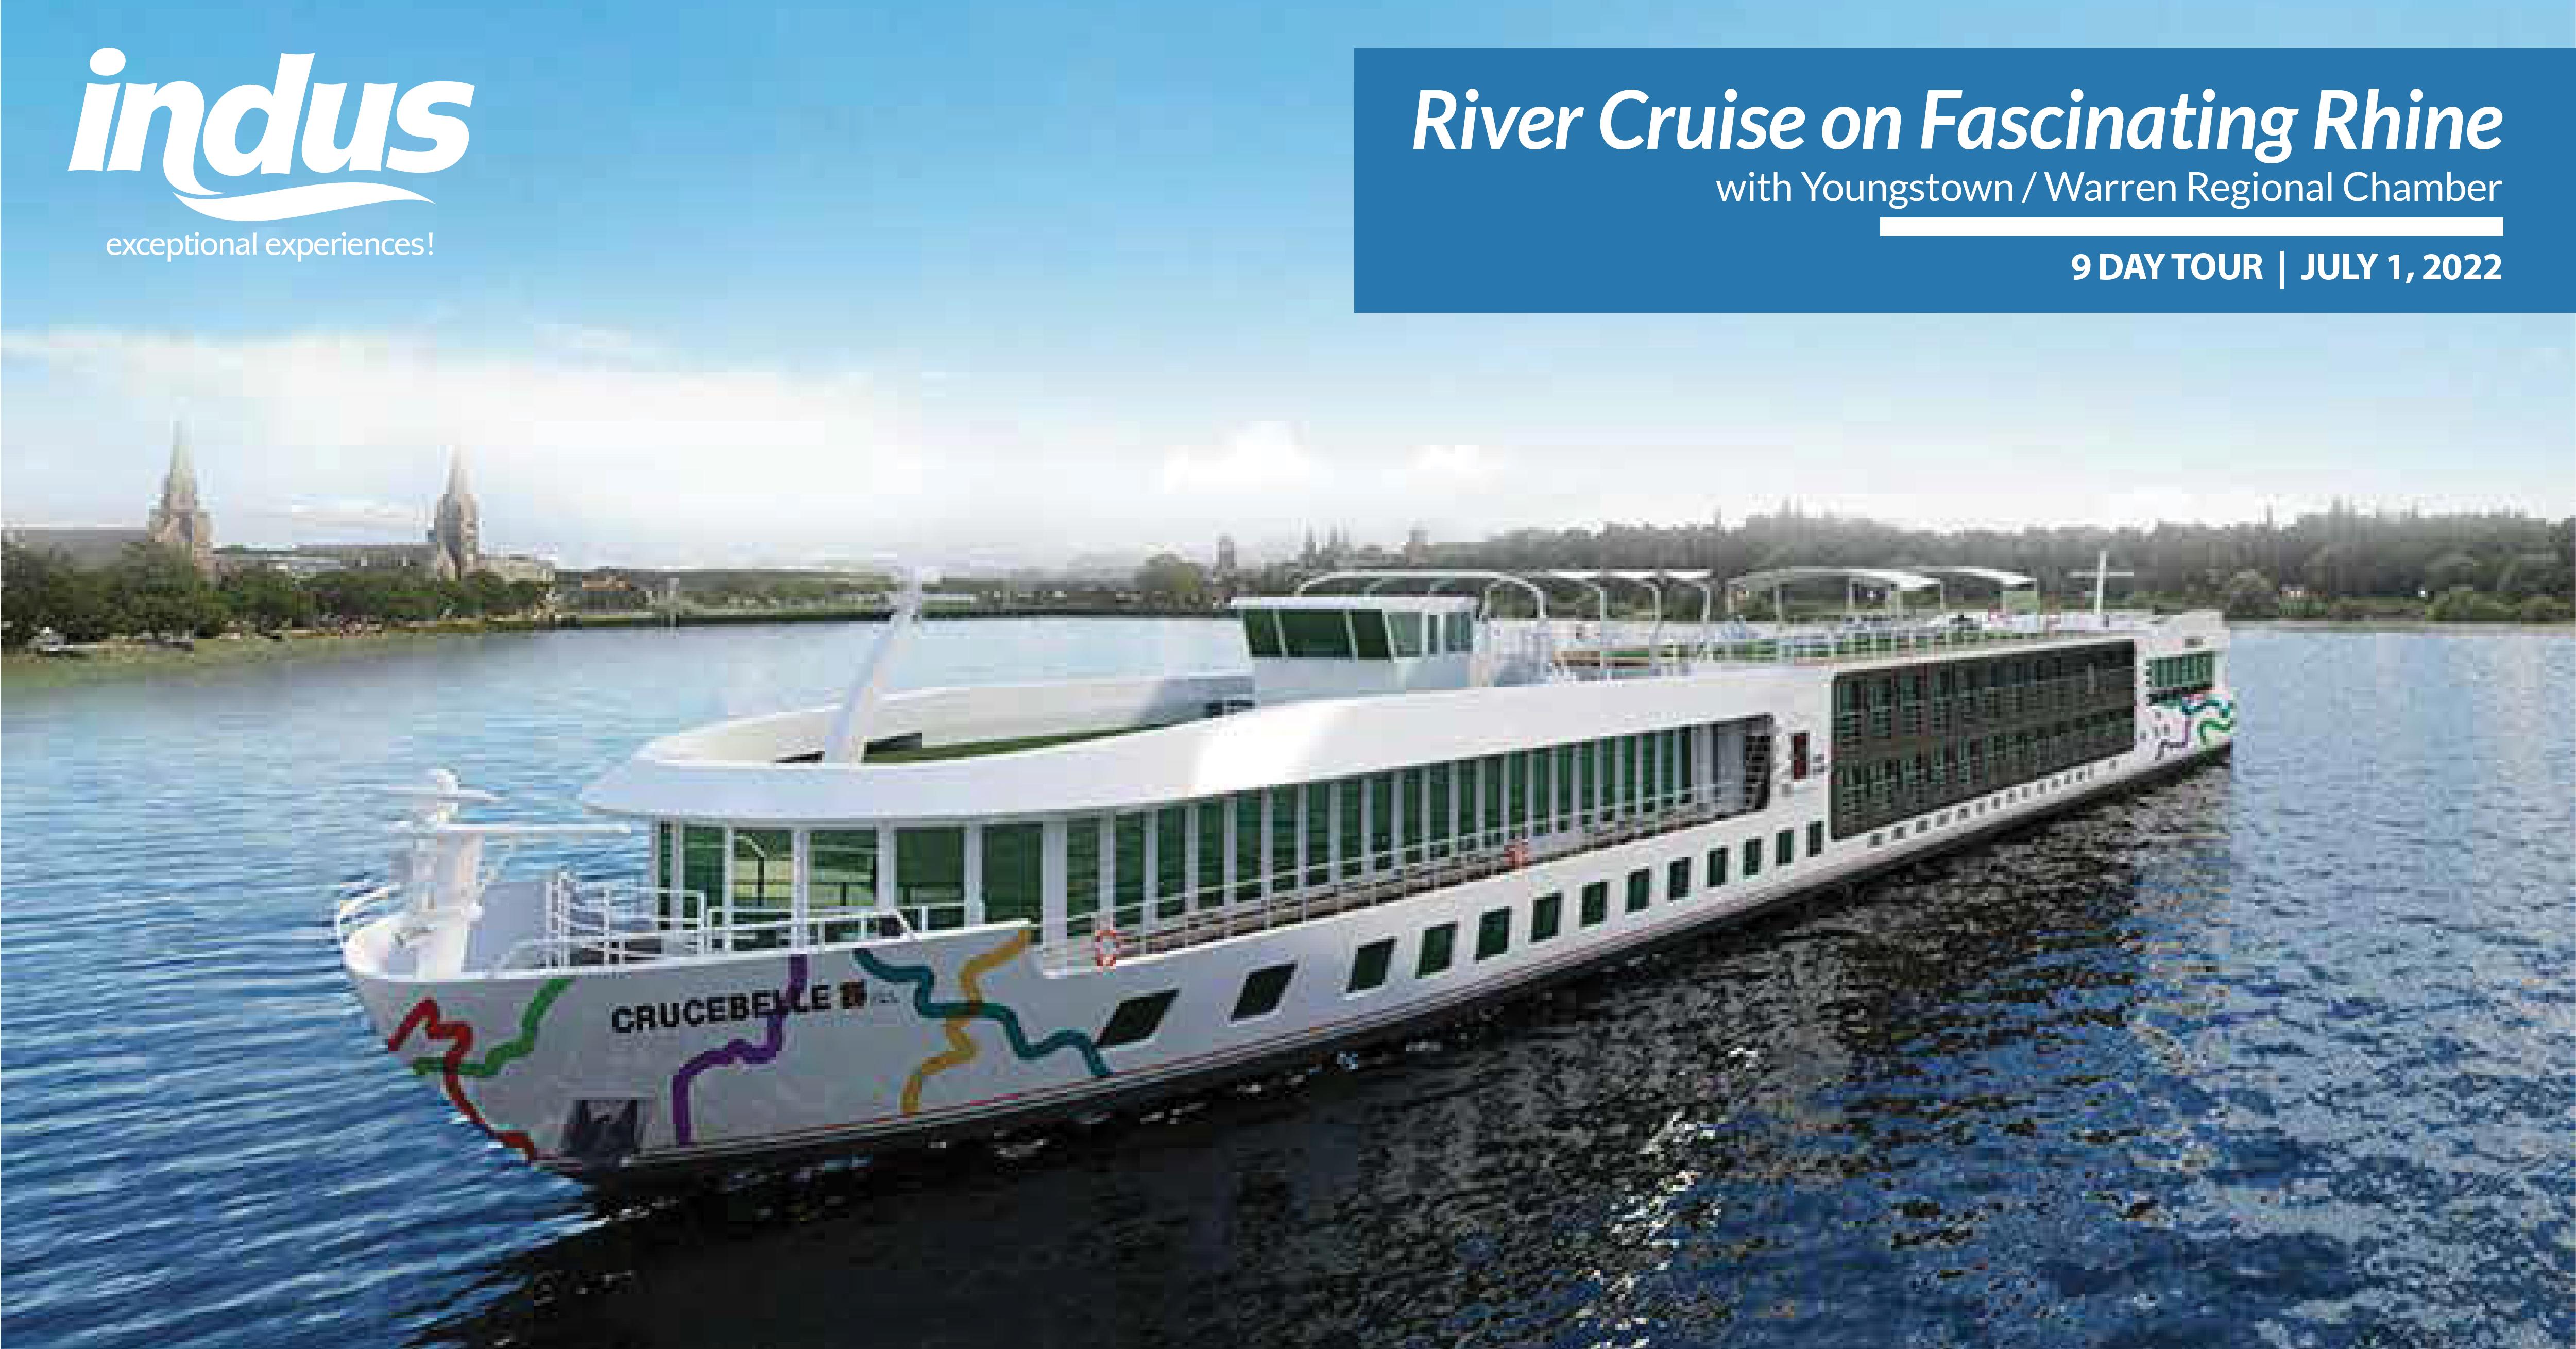 River Cruise on Fascinating Rhine